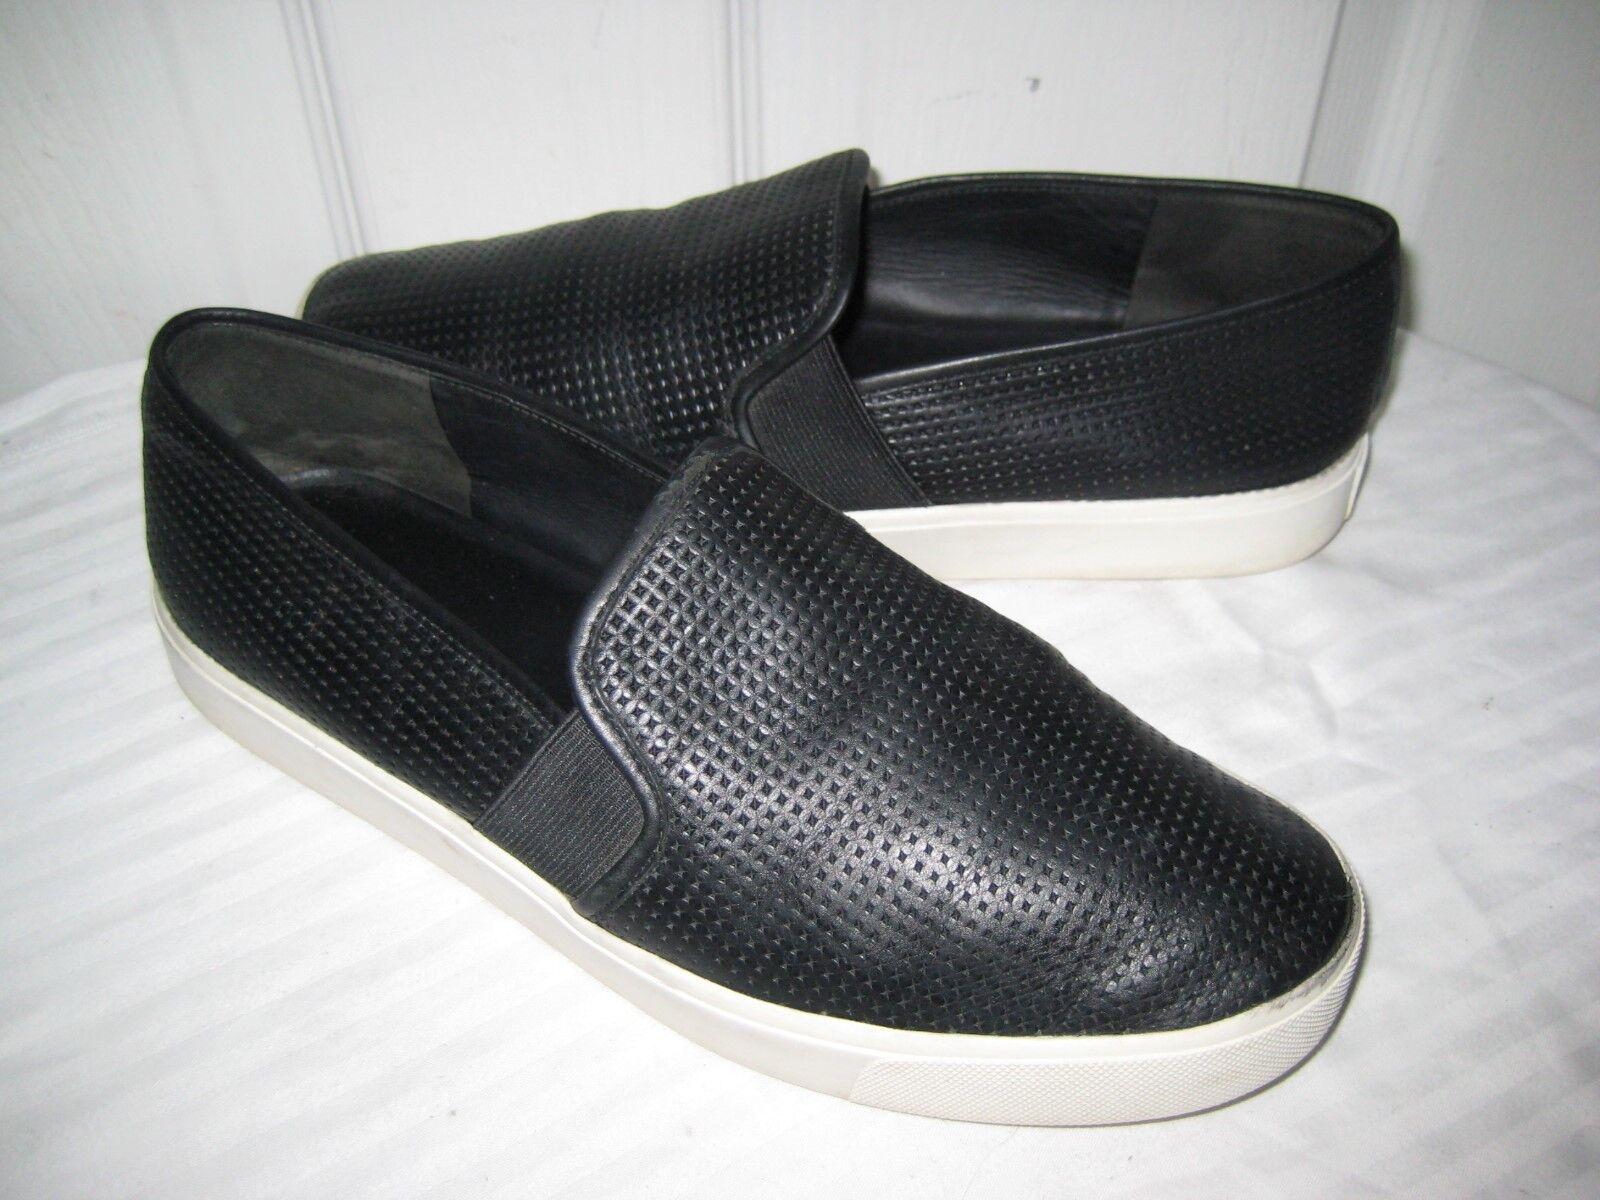 Vince Blair 5 5 5 Negro Zapatos Tenis de Moda para Mujer Talla 38.5 8.5 M.  precio mas barato